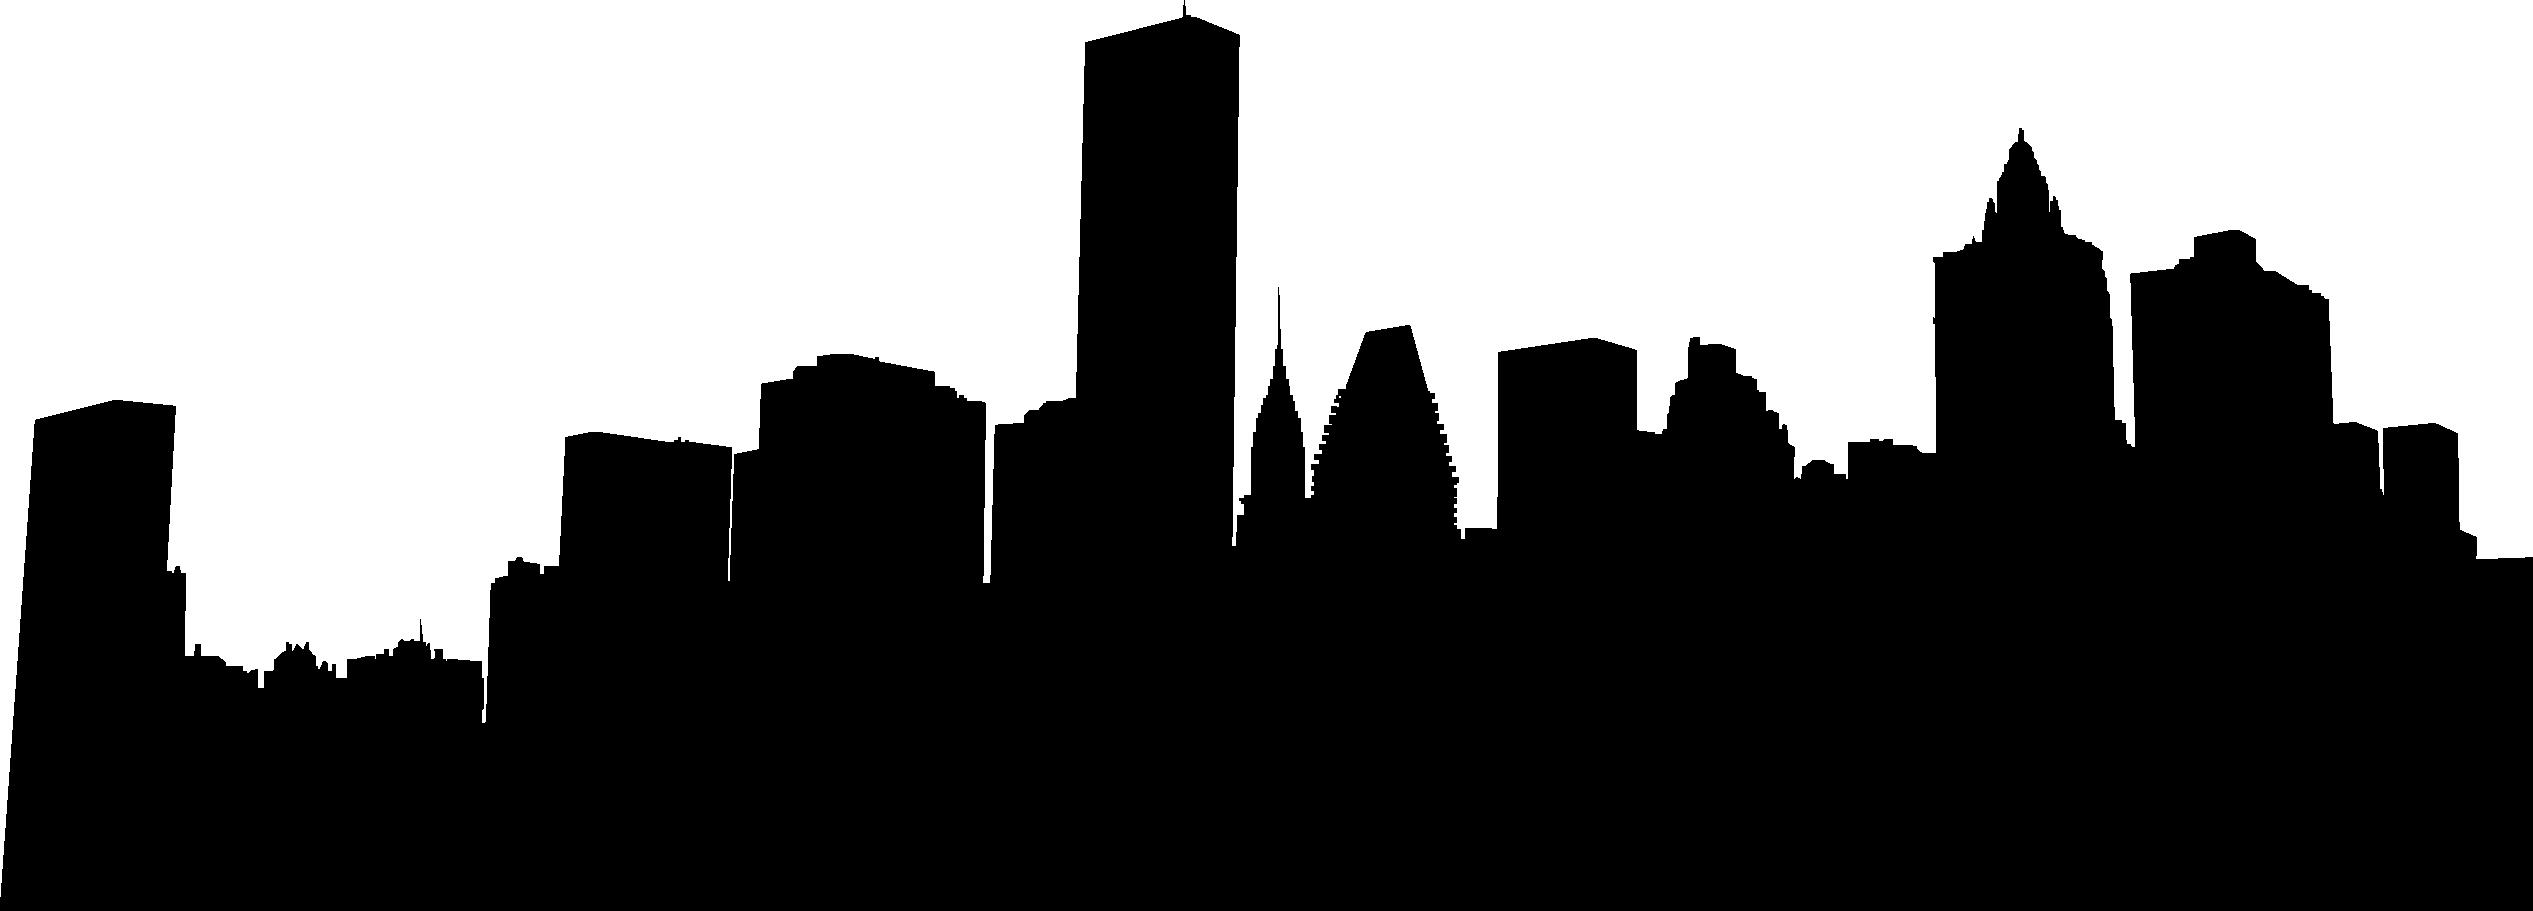 philadelphia skyline silhouette at getdrawings com free for rh getdrawings com